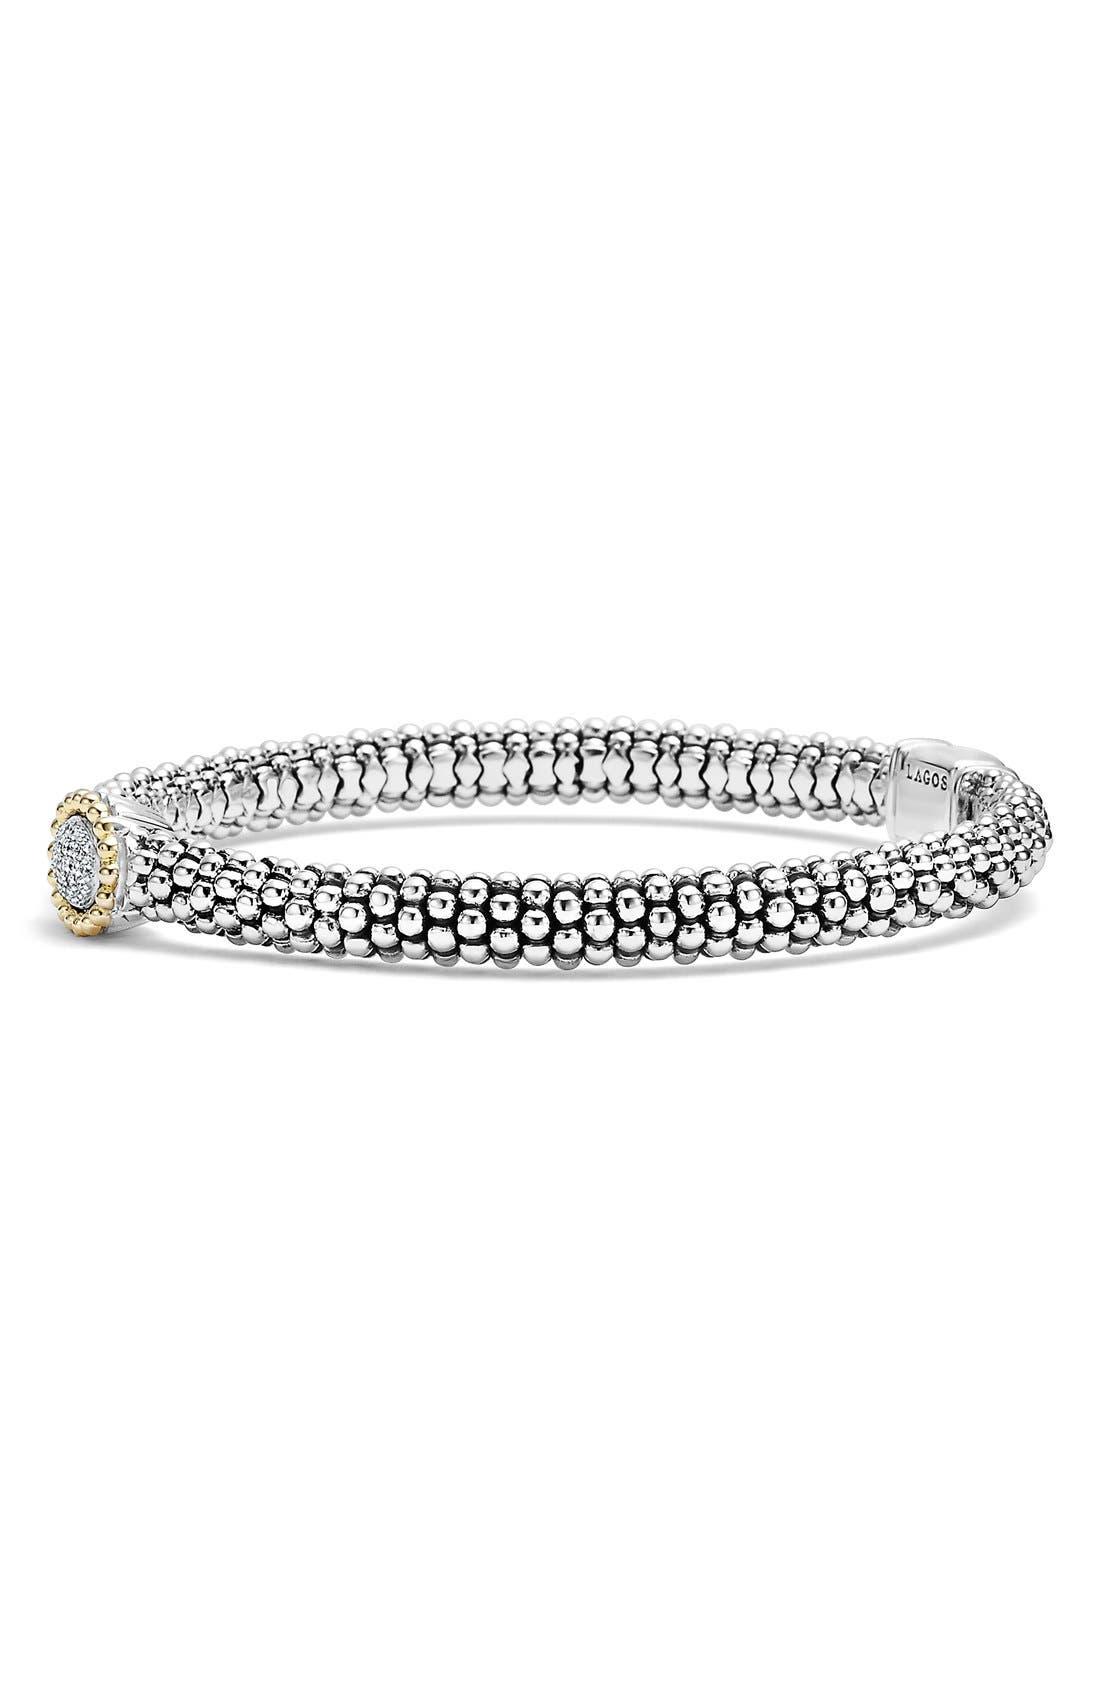 Diamond Caviar Oval Bracelet,                             Alternate thumbnail 3, color,                             040